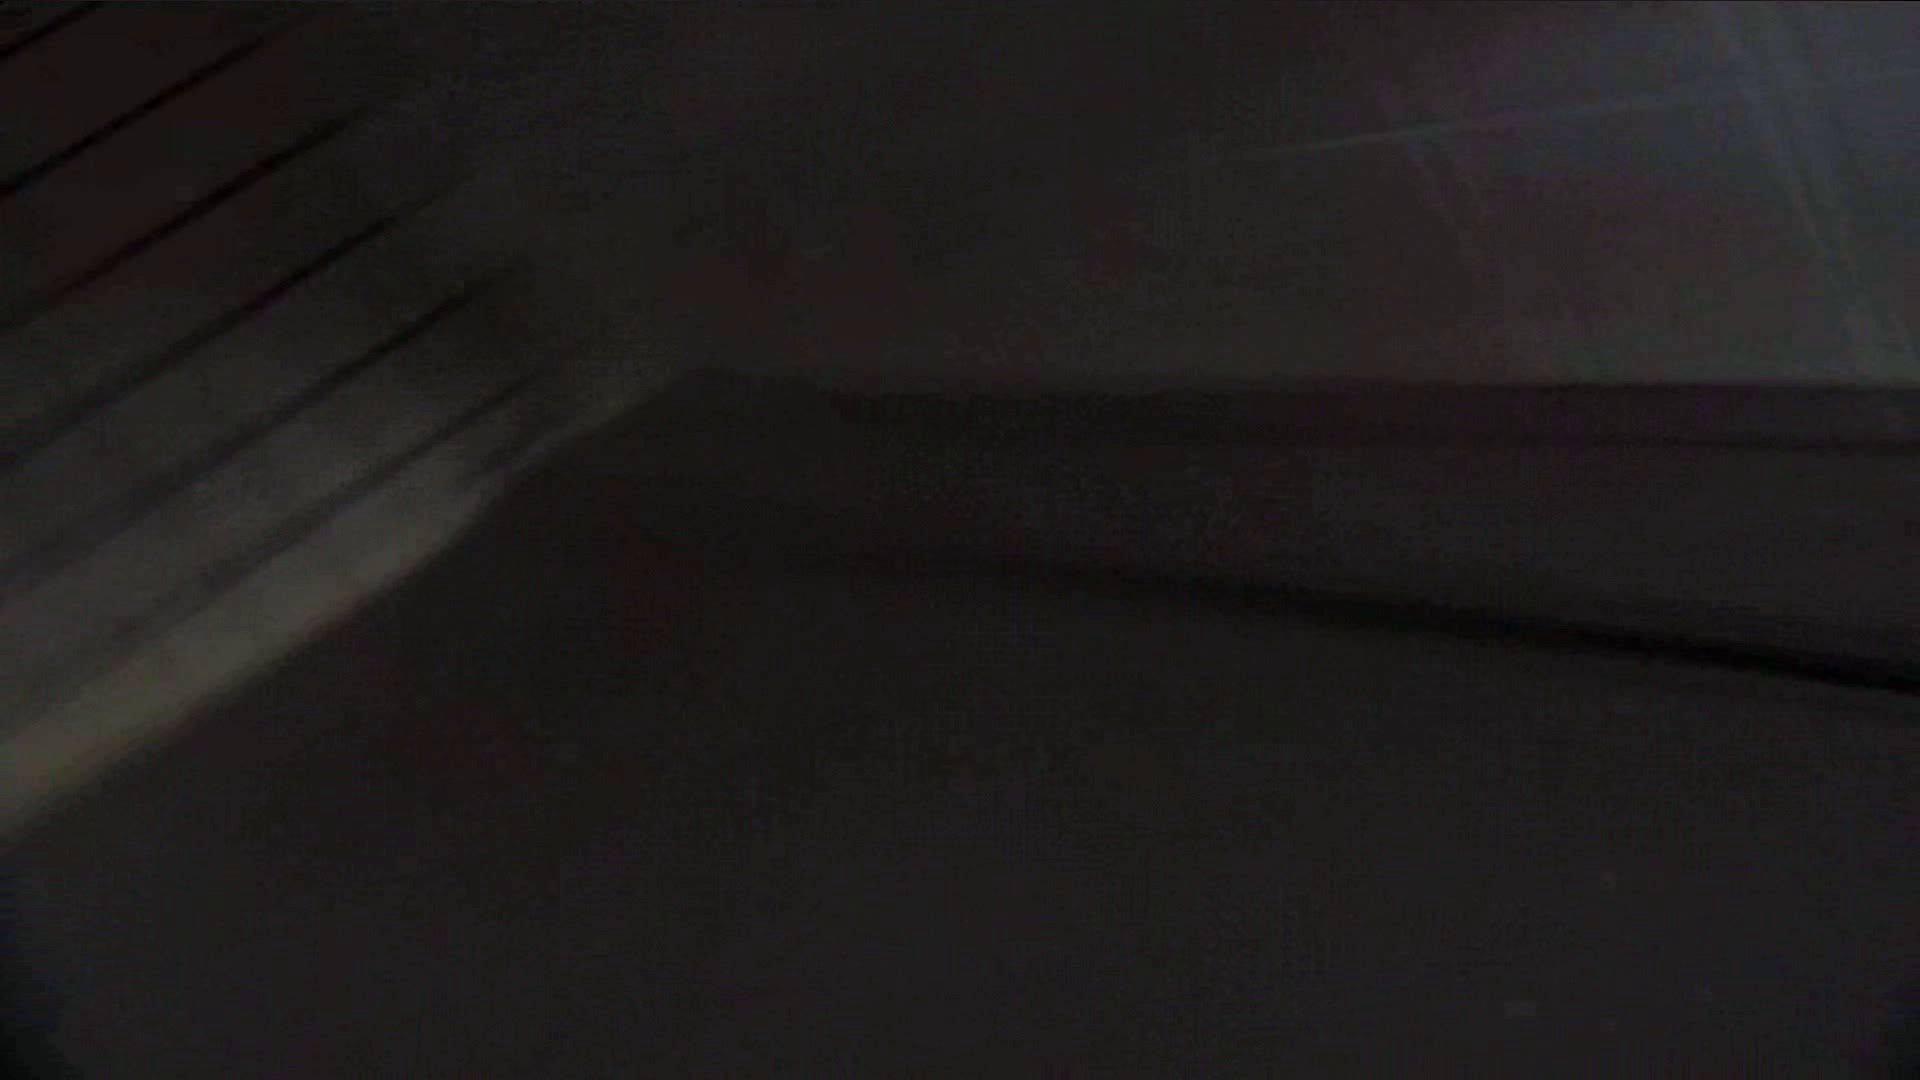 vol.06 命がけ潜伏洗面所! ツン!とした子は割と几帳面? OLエロ画像  99PICs 8